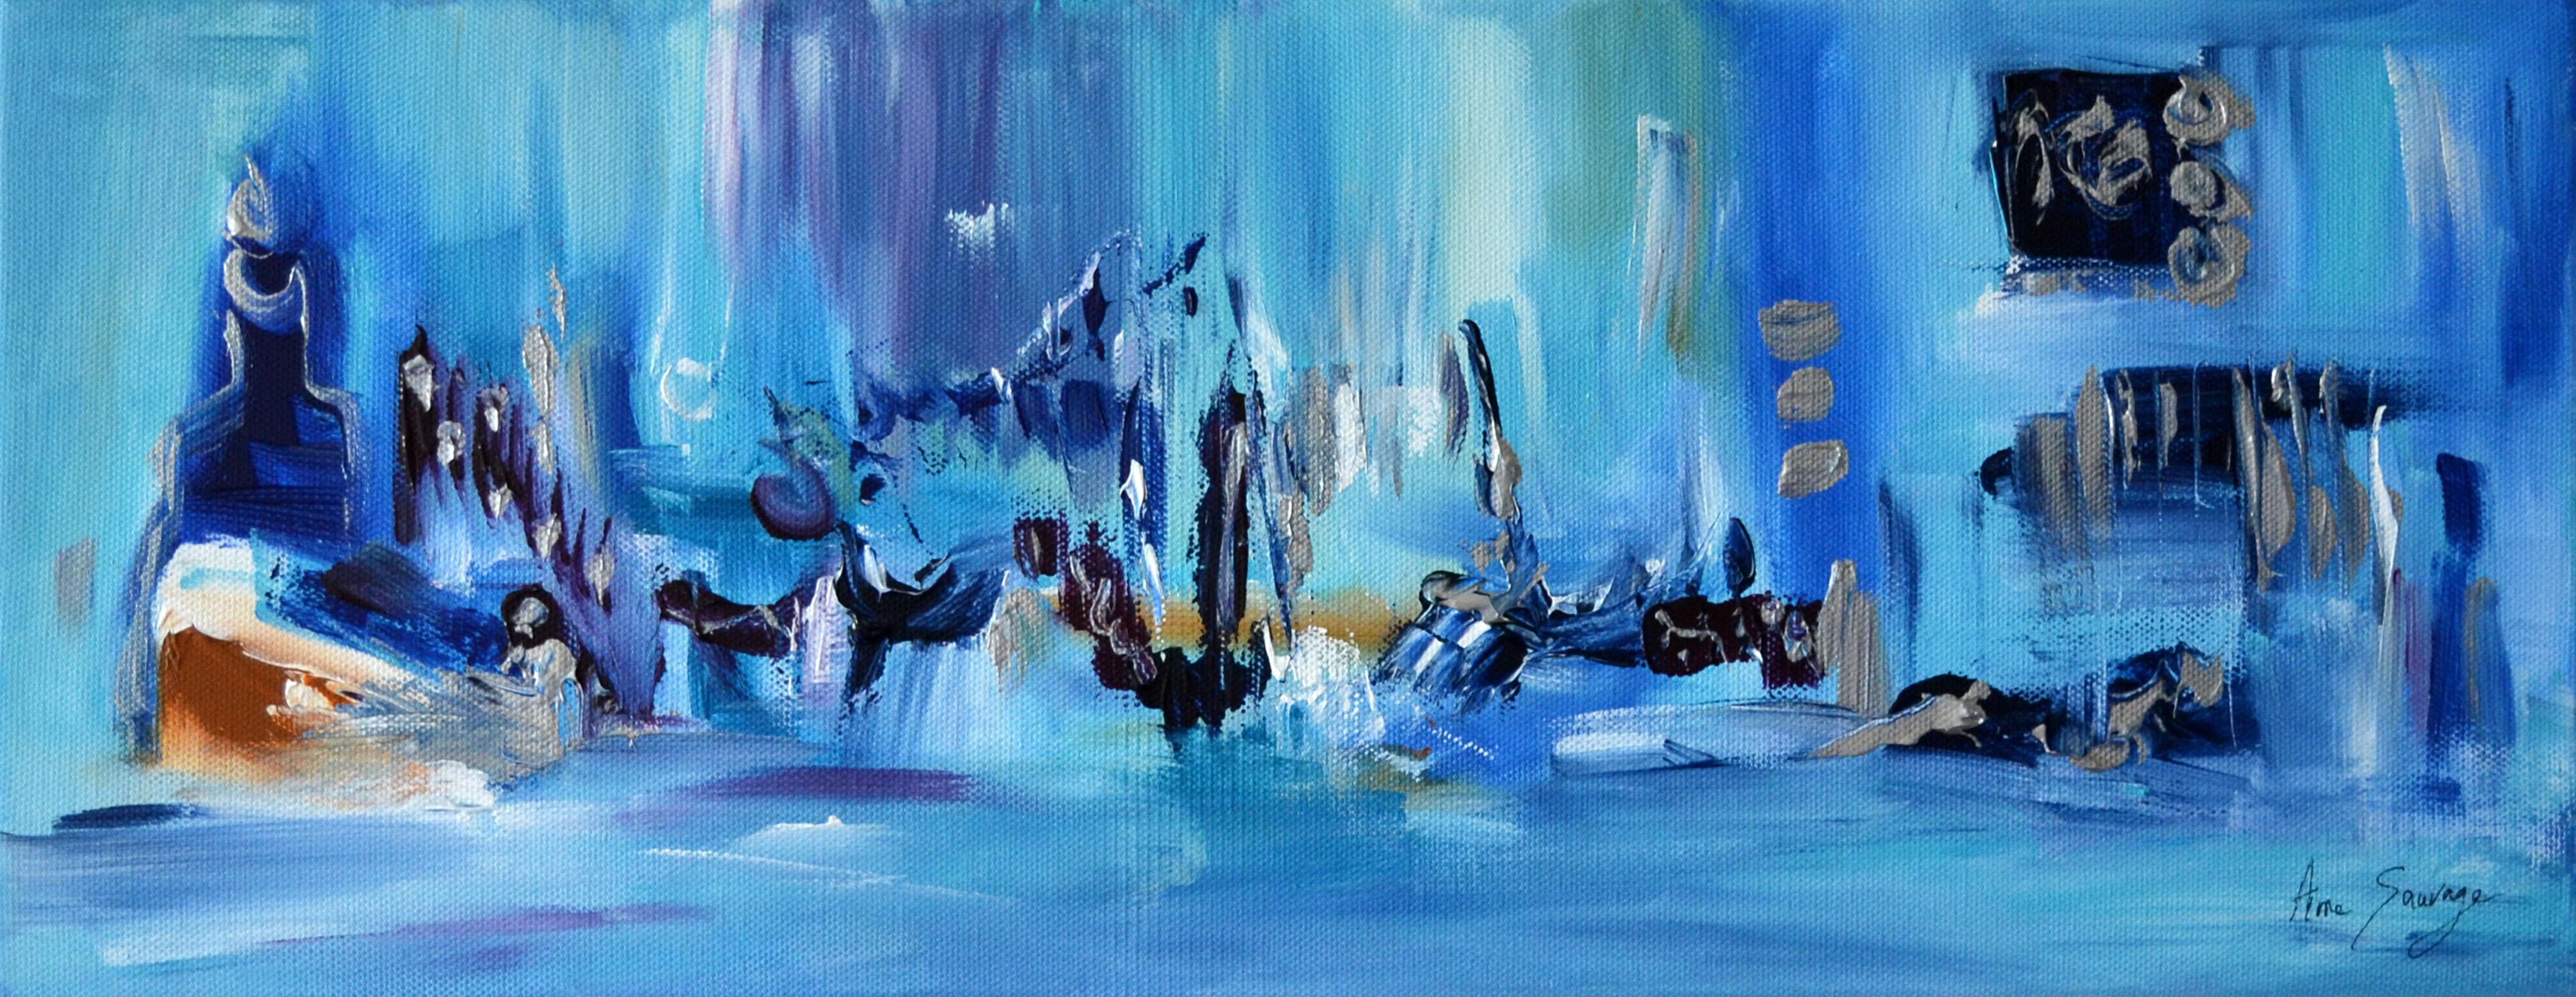 tableau panoramique bleu